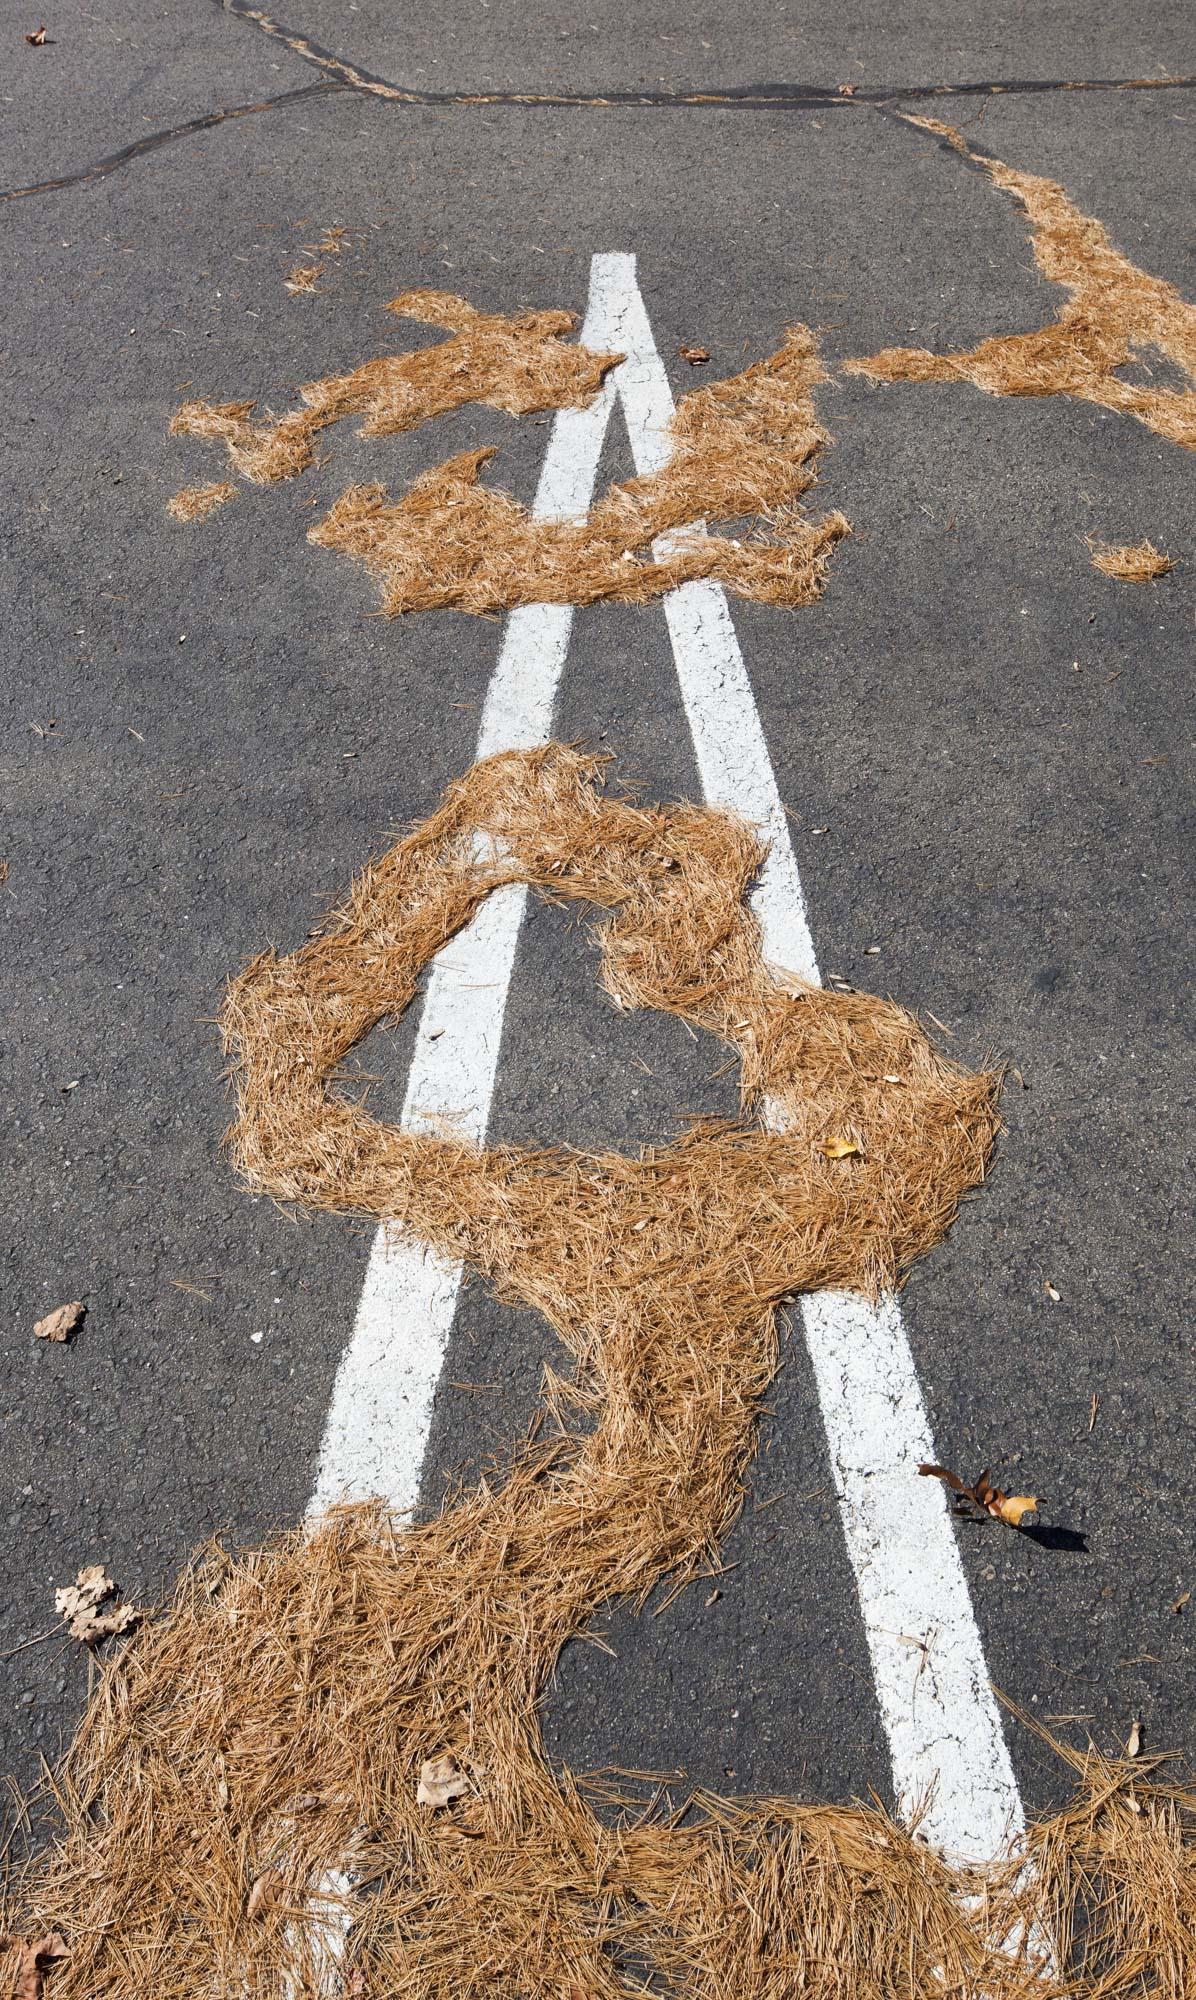 pine needle pavement web.jpg